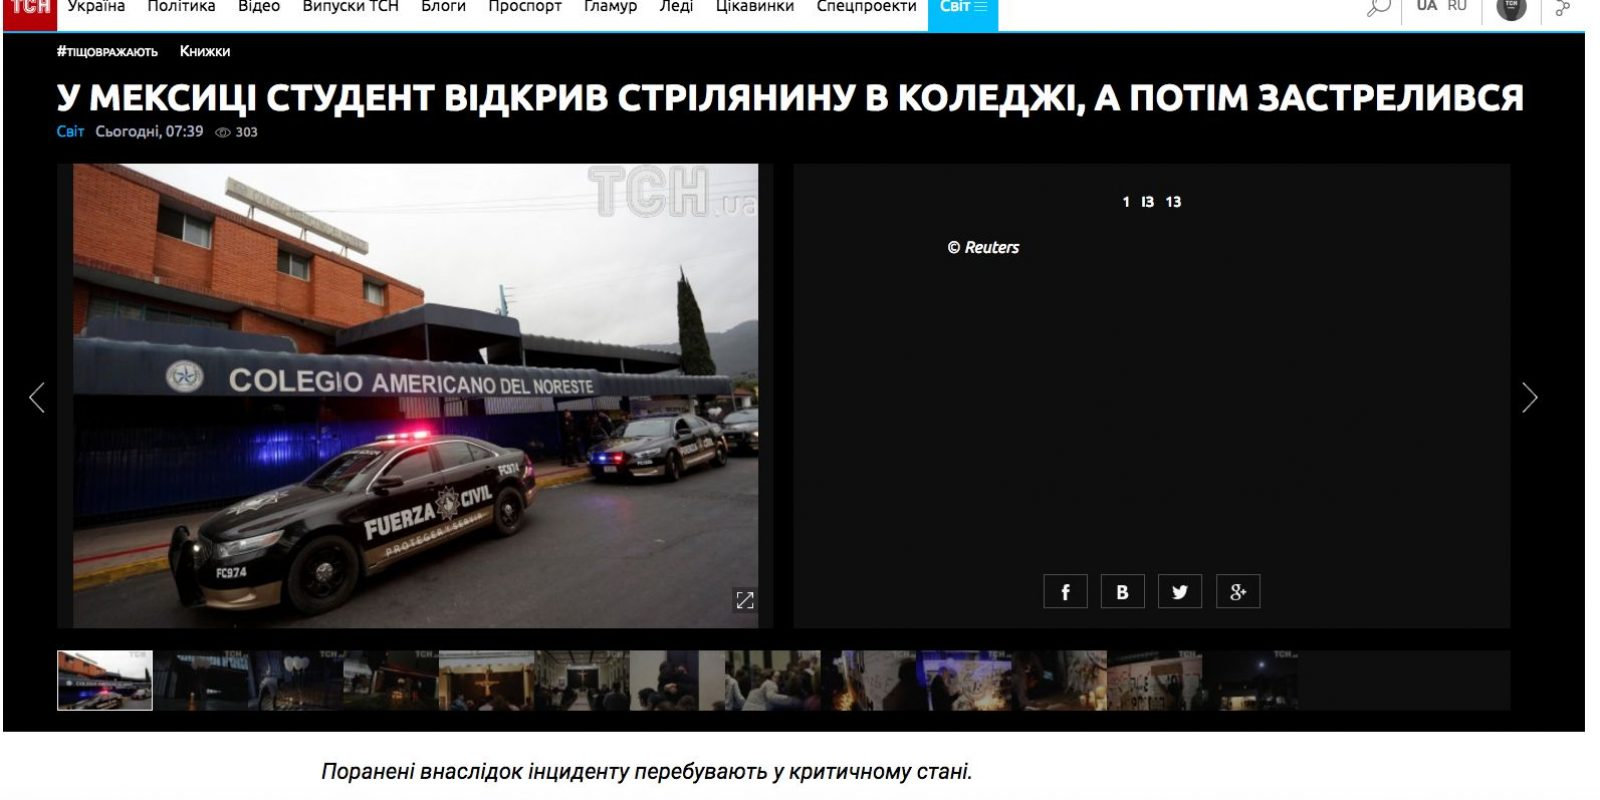 TCH – Ucrania